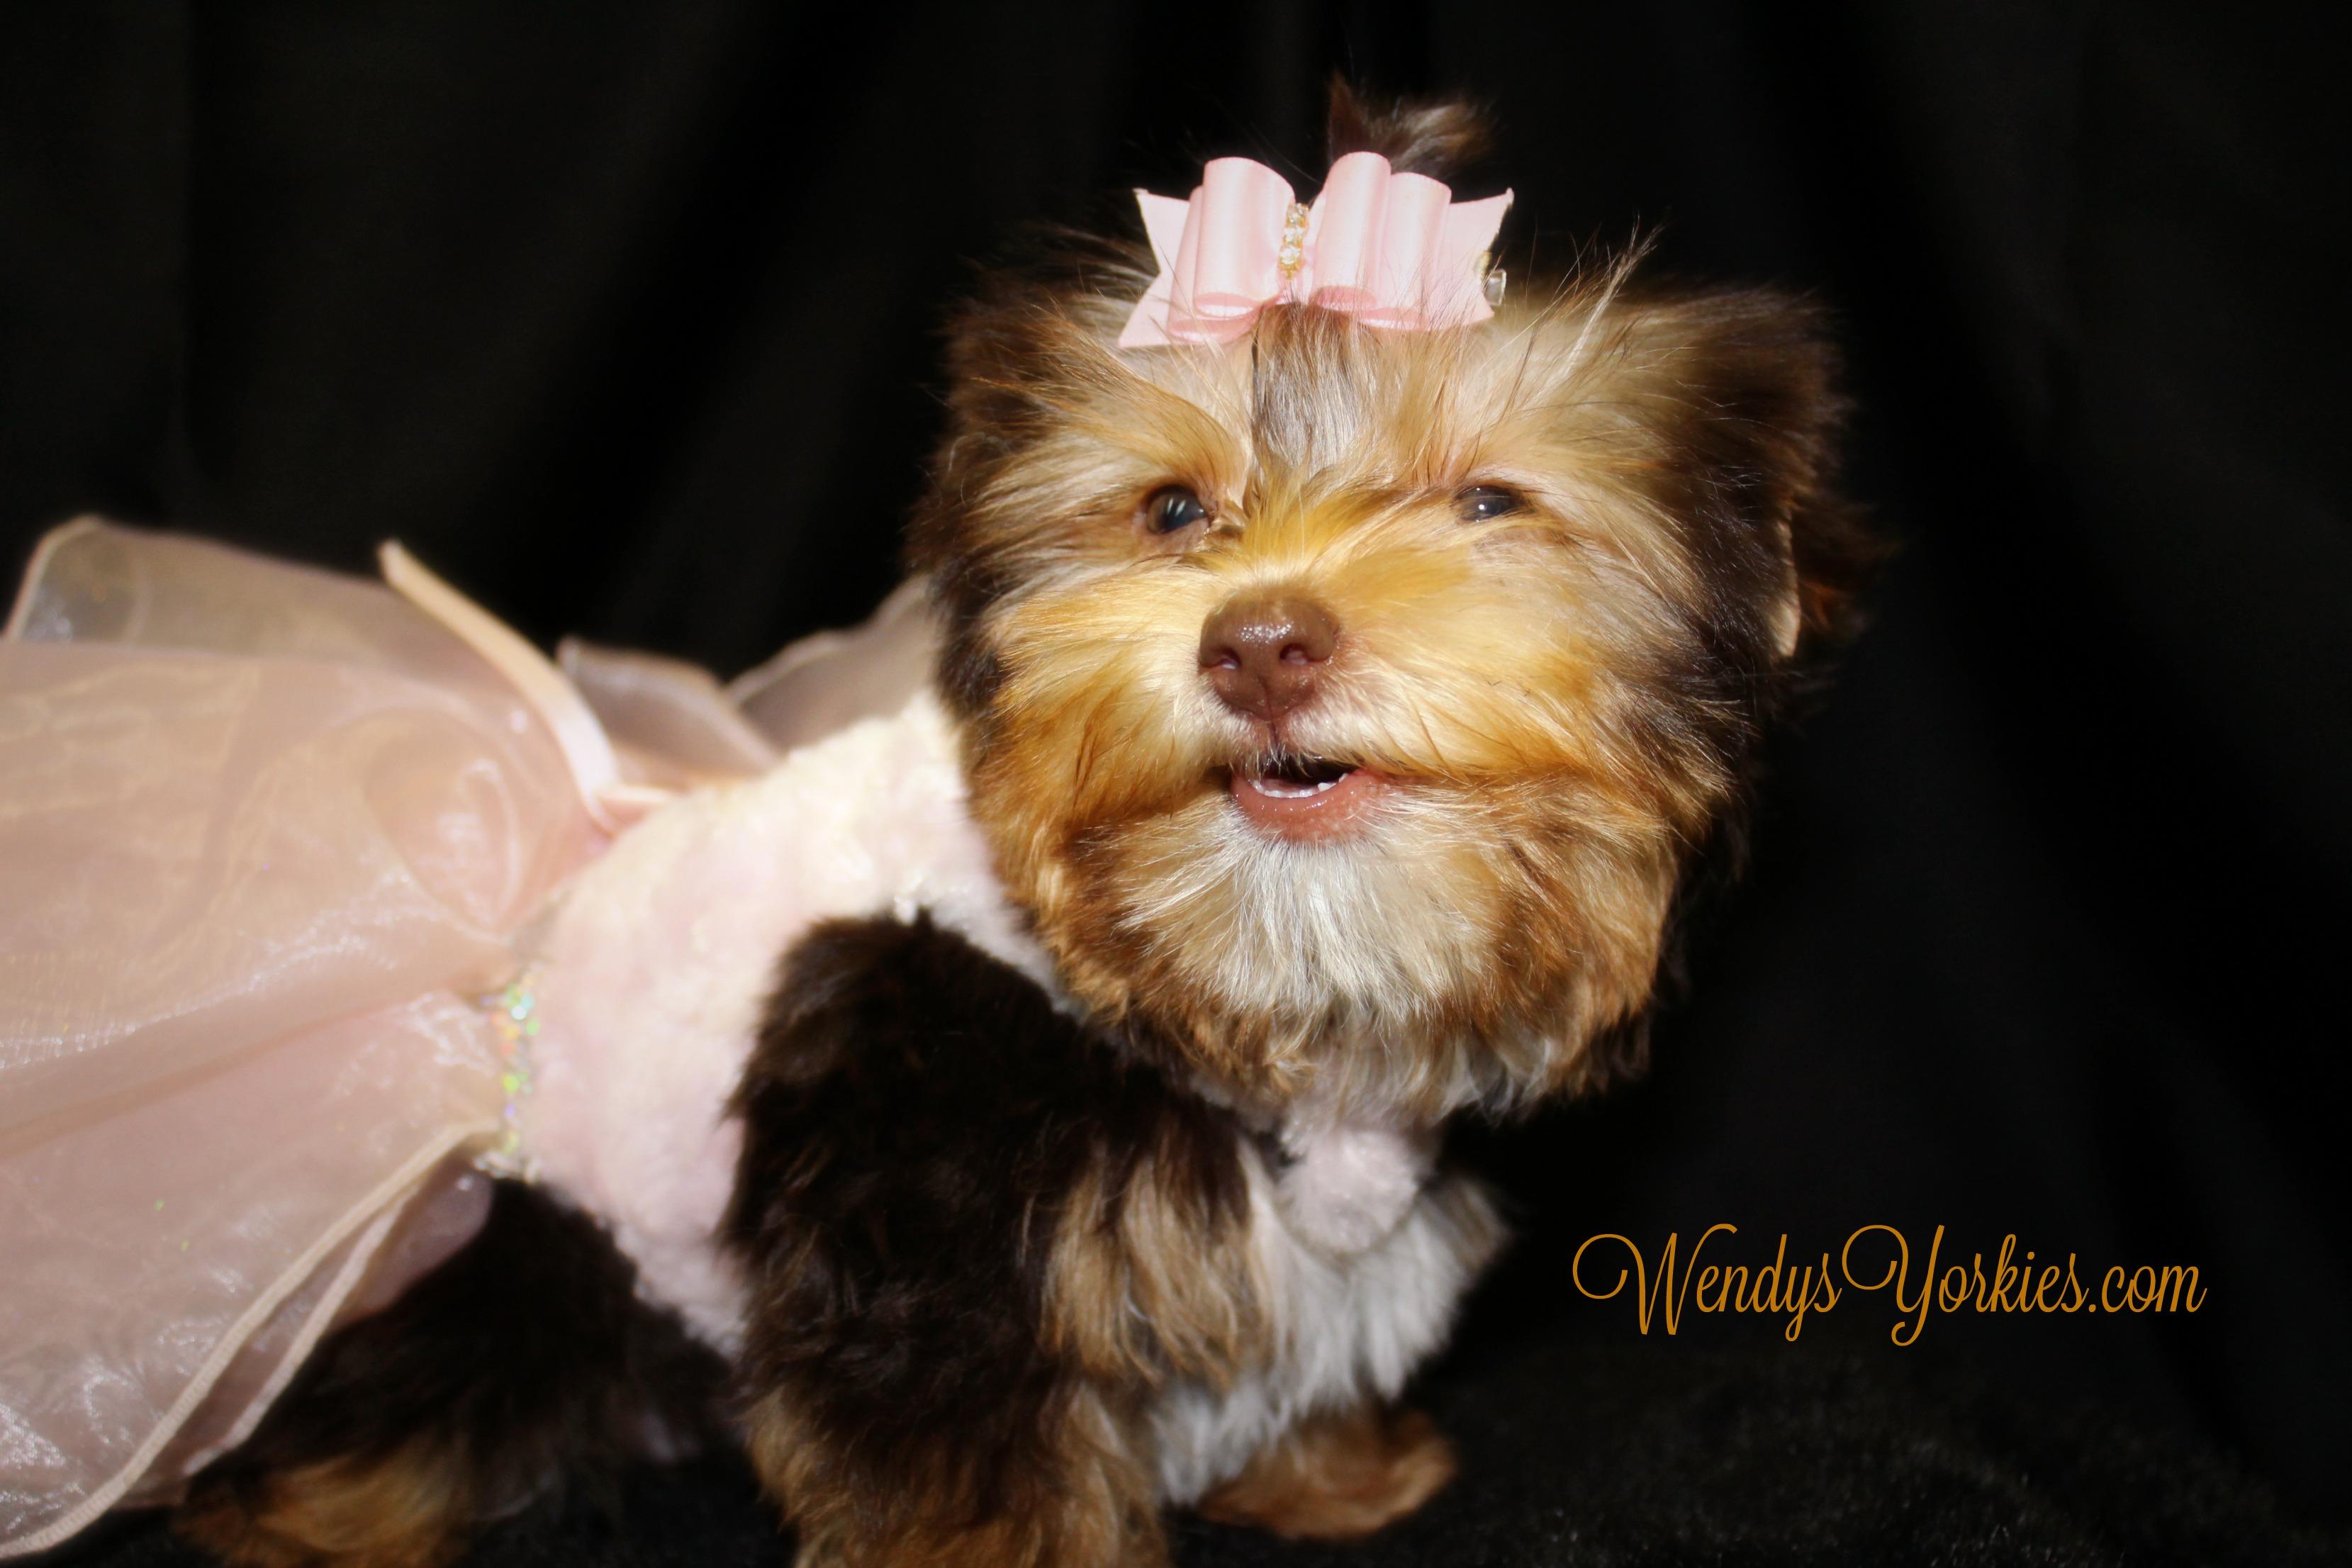 Chocolate Yorkie puppy for sale, WendysYorkies.com, Allie 3